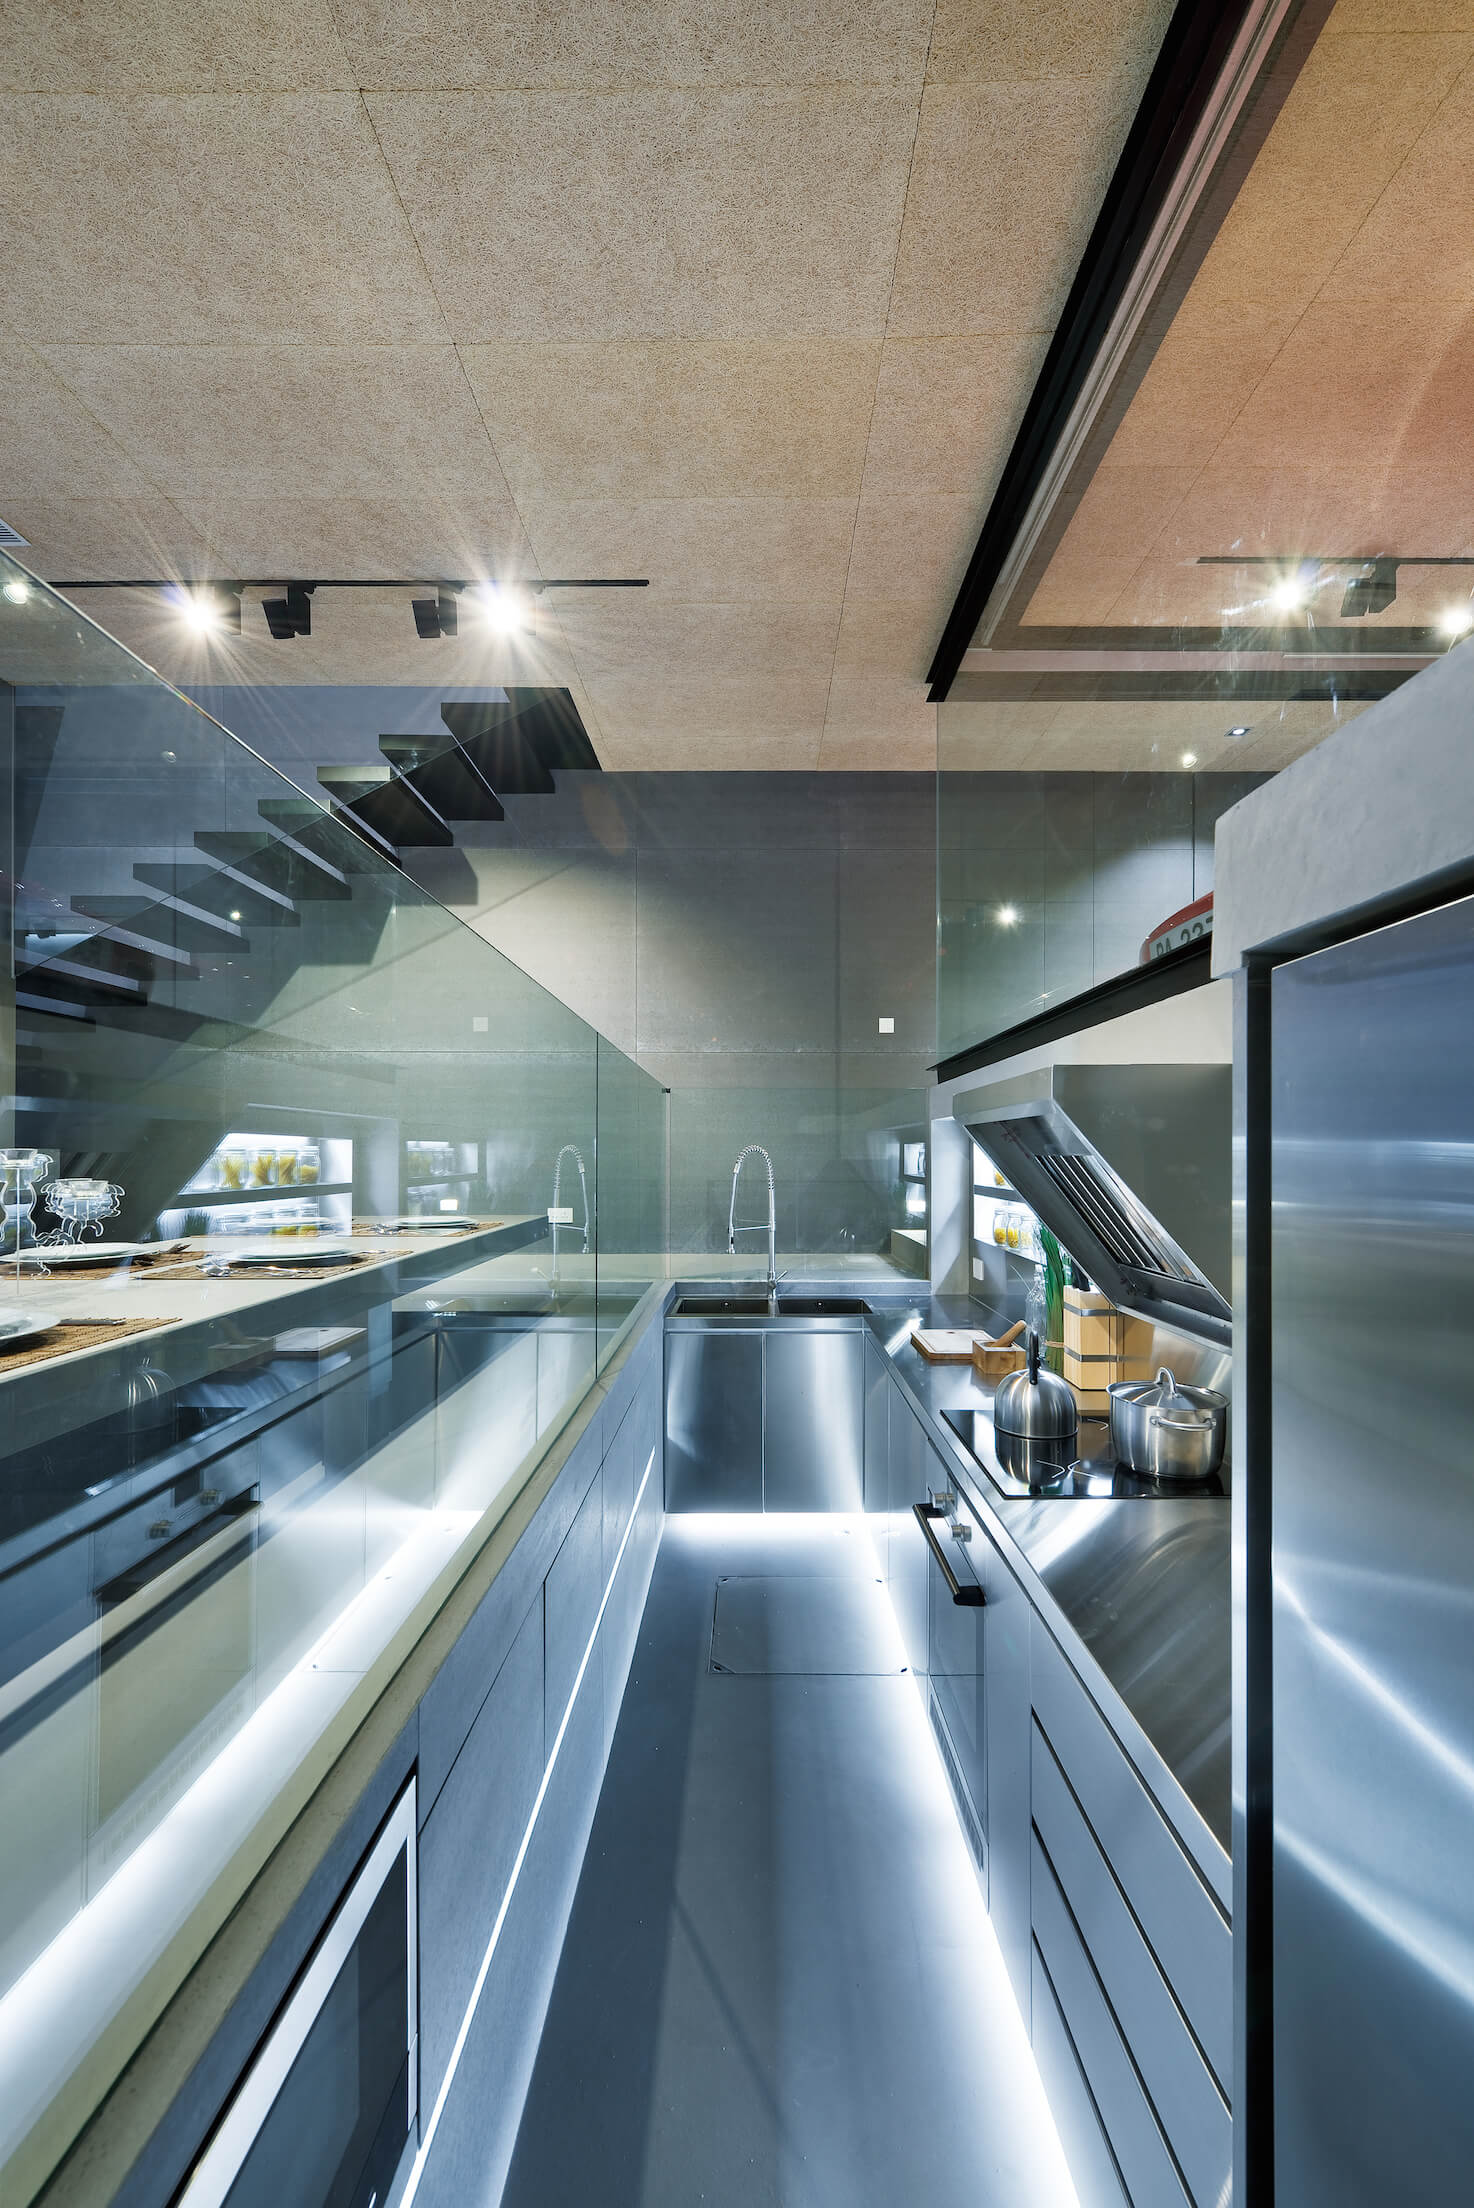 Close view of ultra-modern kitchen, utilizing novel sunken space, awash in brushed aluminum material.